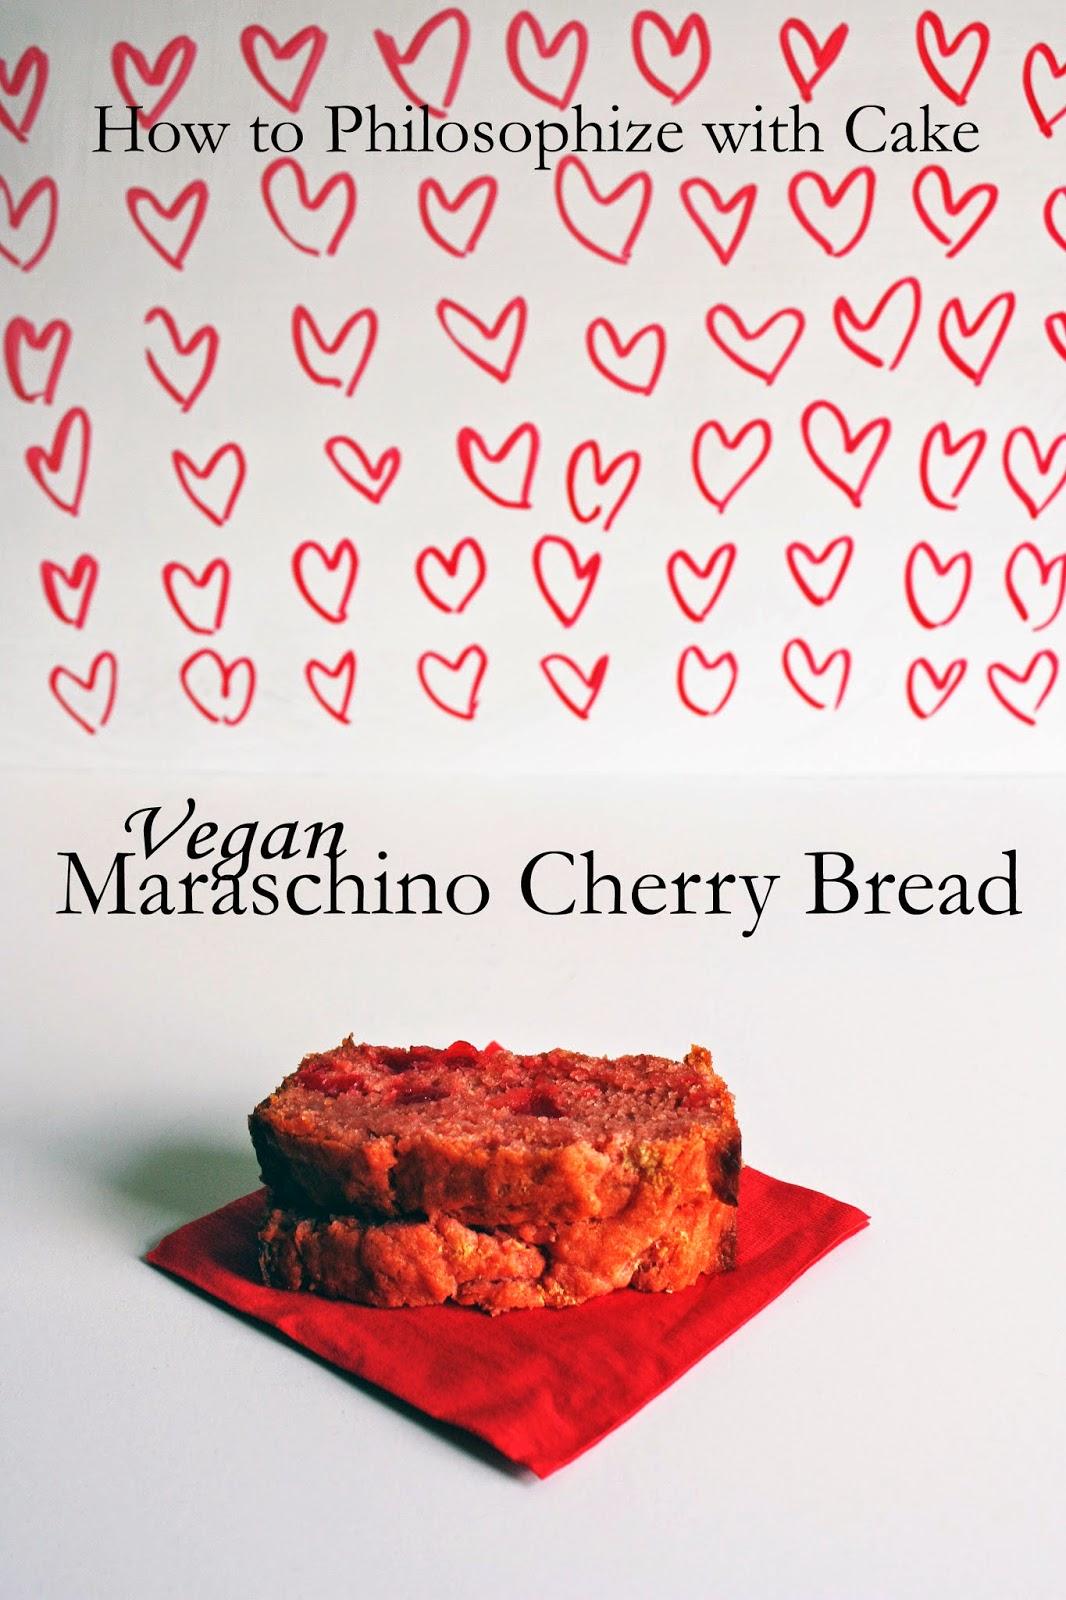 how to philosophize with cake vegan maraschino cherry quick bread